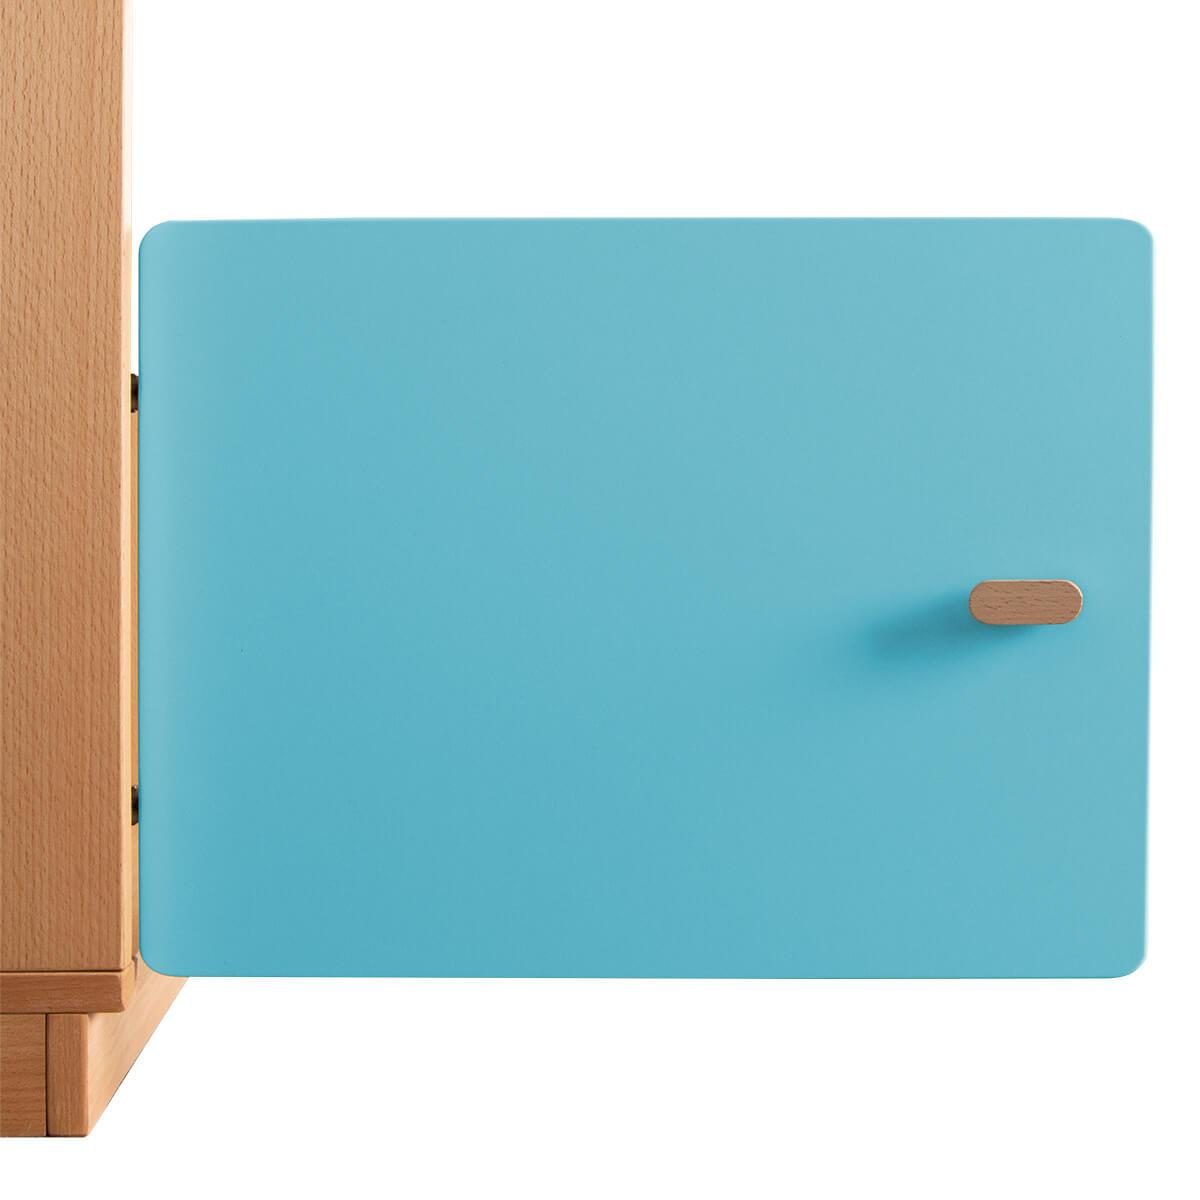 Schranktür 1/5 35cm-Griff DESTYLE de Breuyn MDF kristallblau-lackiert